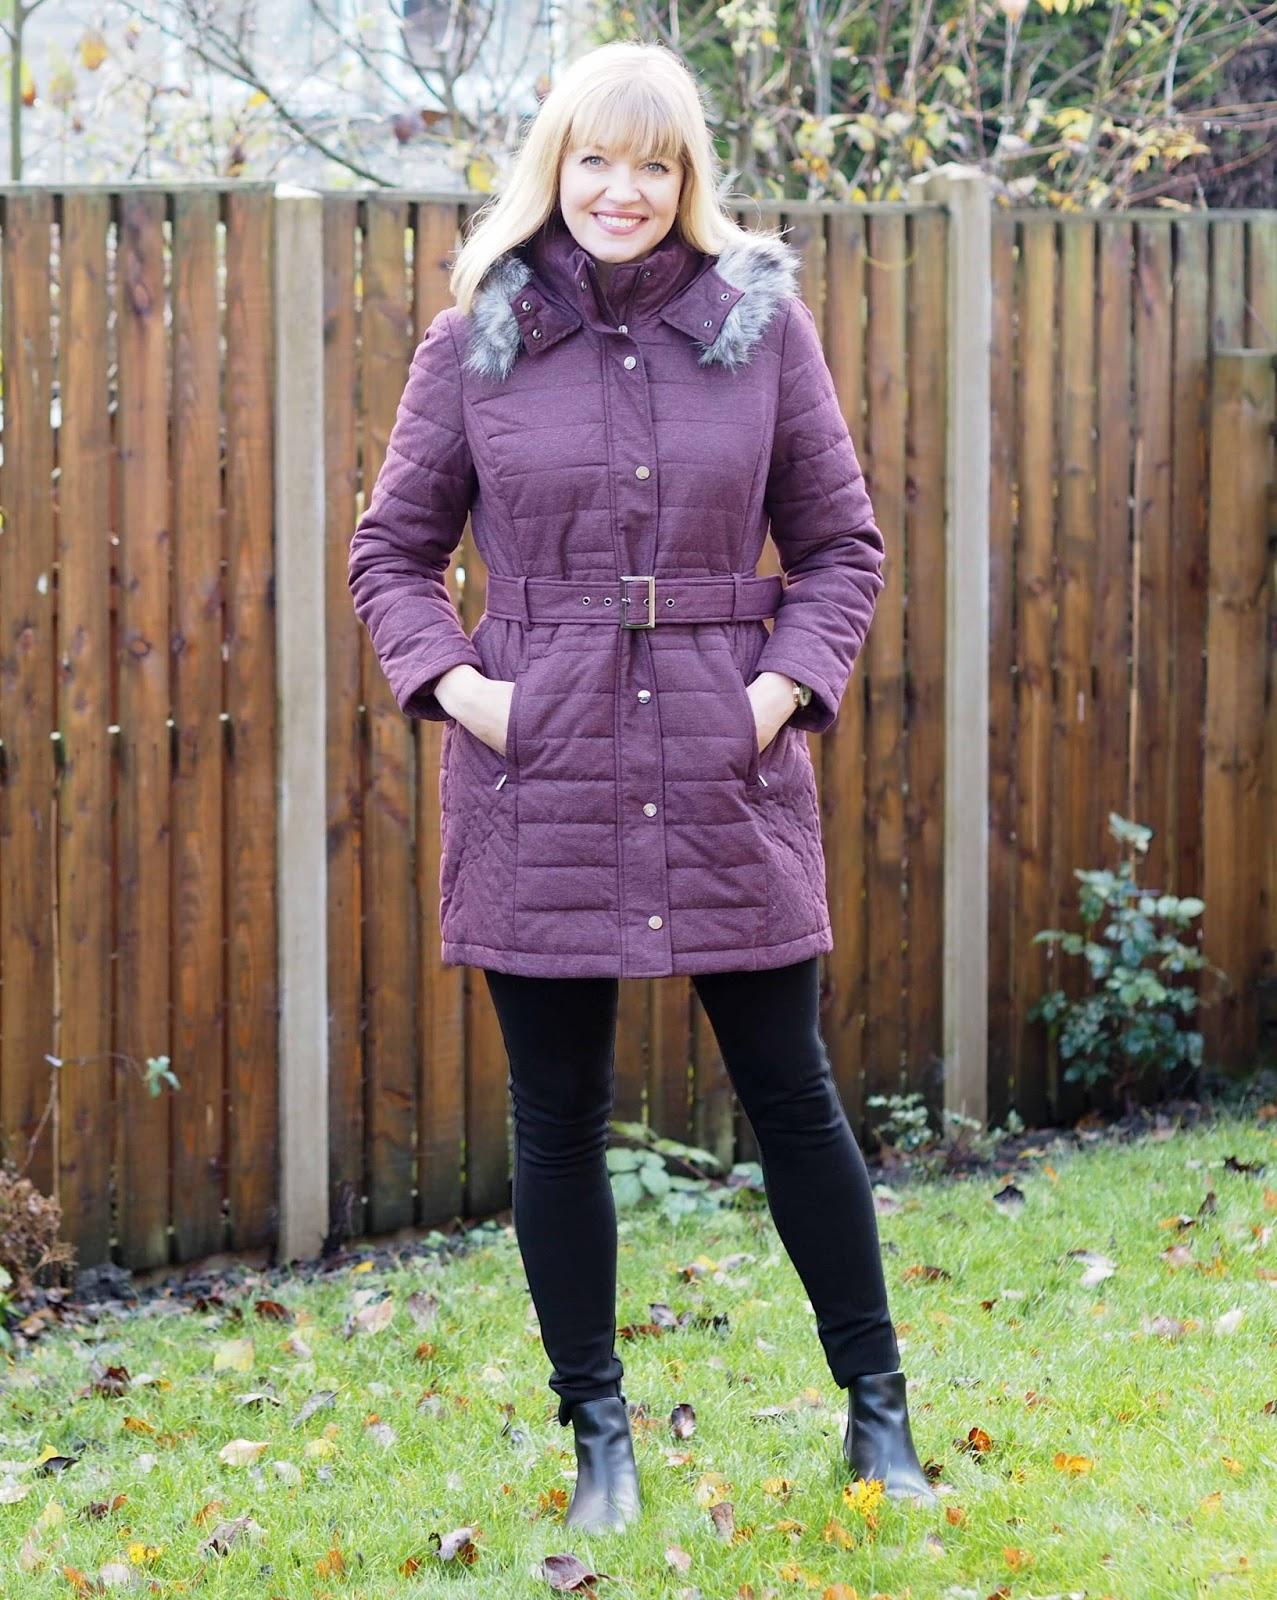 Dash fashion parka coat Dash winter warmers and Christmas gift ideas